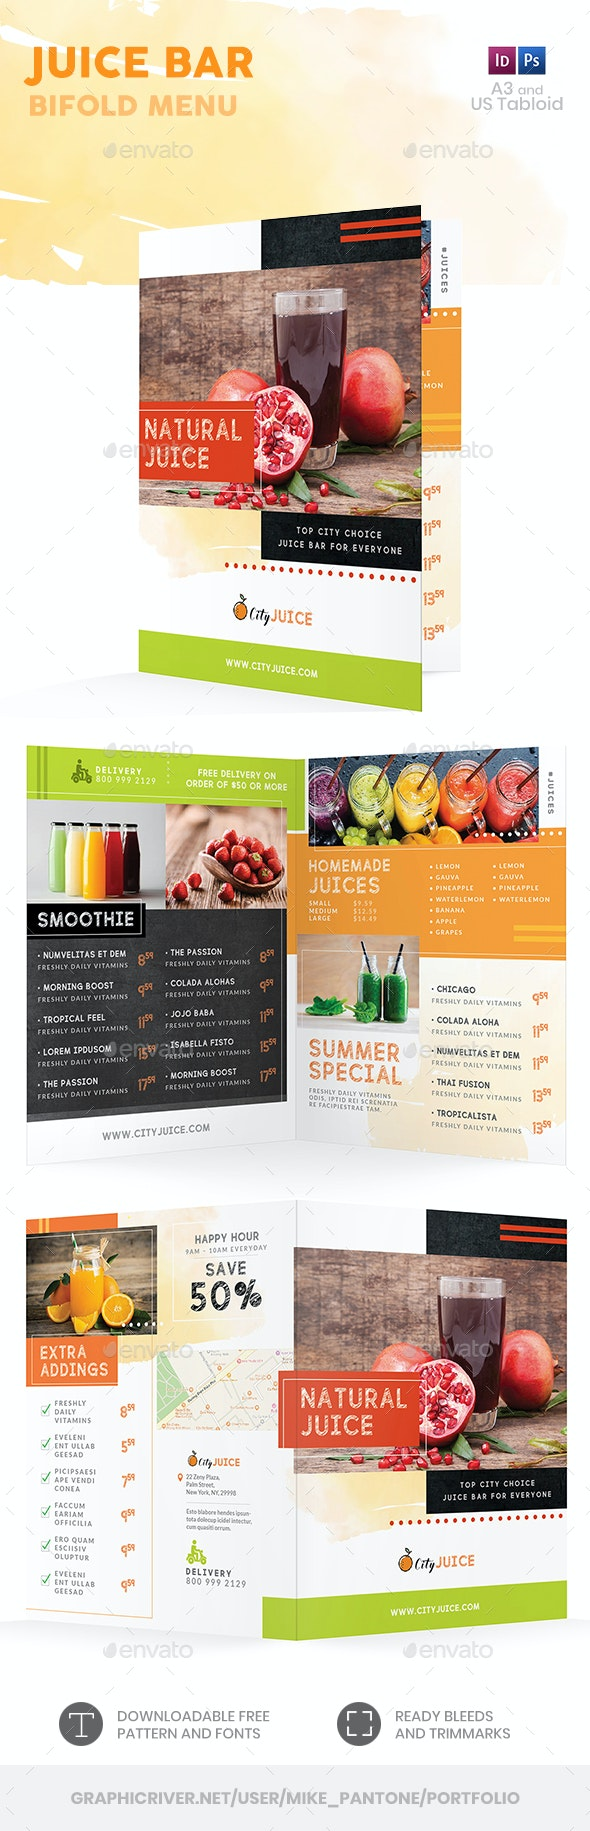 Juice Bar Bifold / Halffold Menu 2 - Food Menus Print Templates